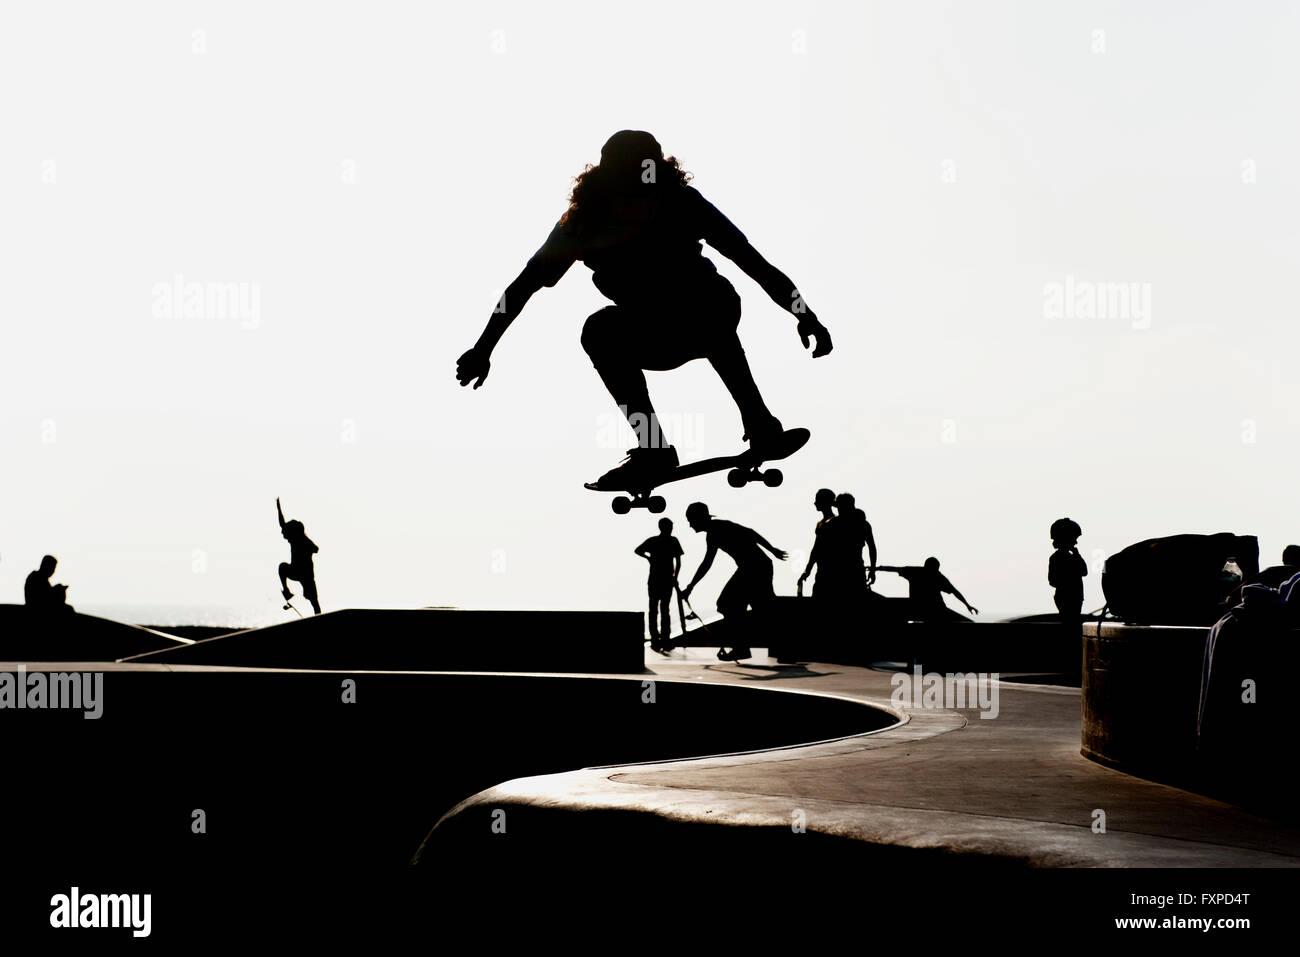 Guidatore di skateboard a skate park, stagliano Immagini Stock